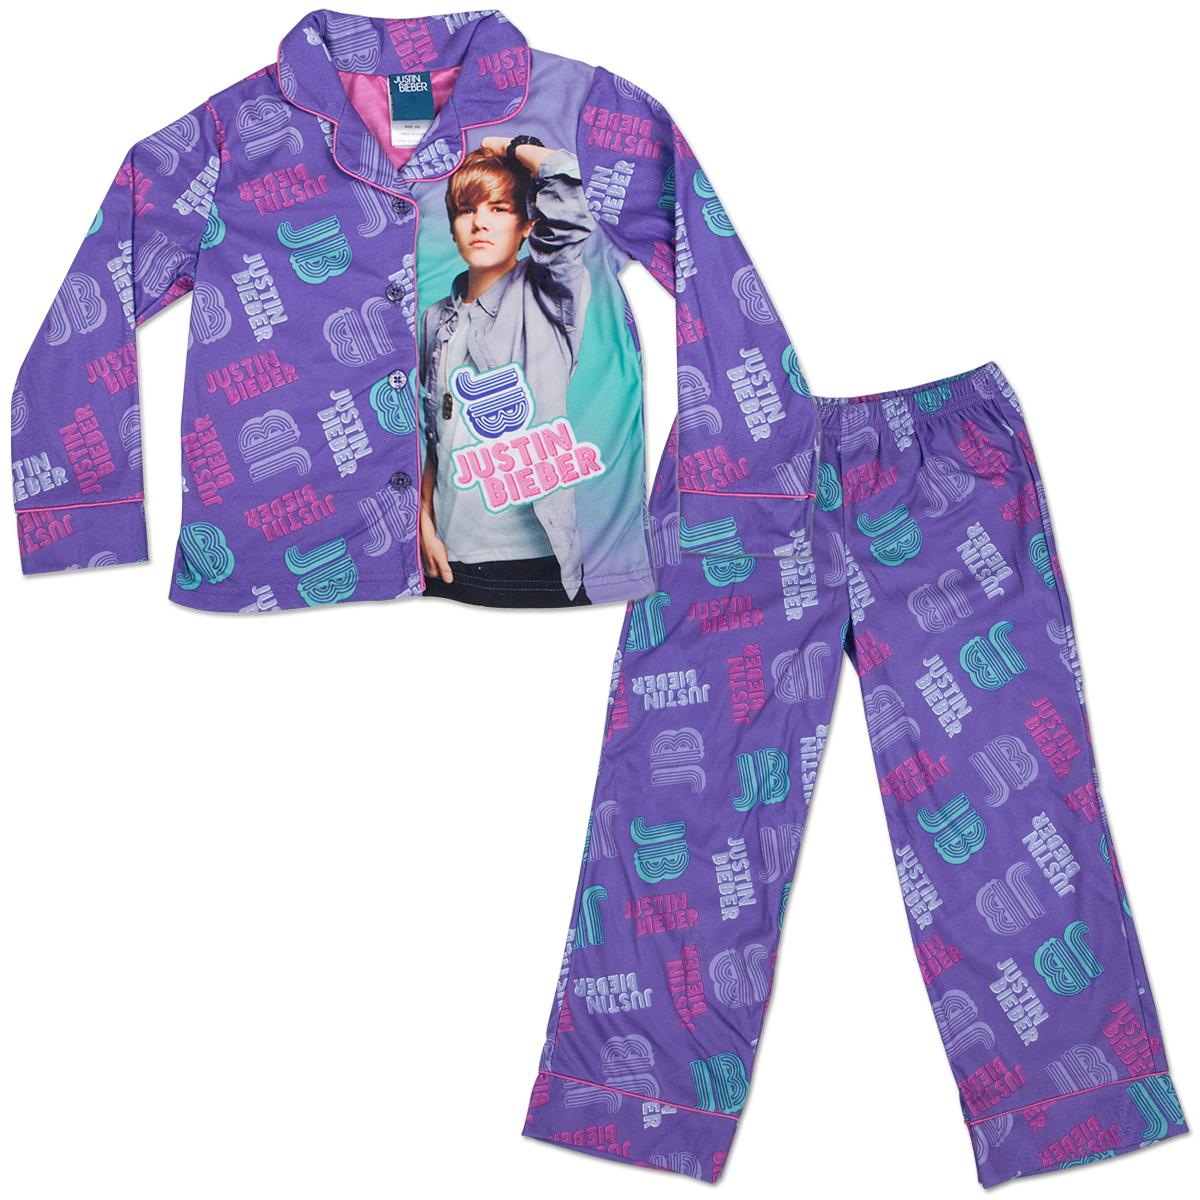 Justin Bieber Bieber Fever Coatstyle Kids' Pajama Set